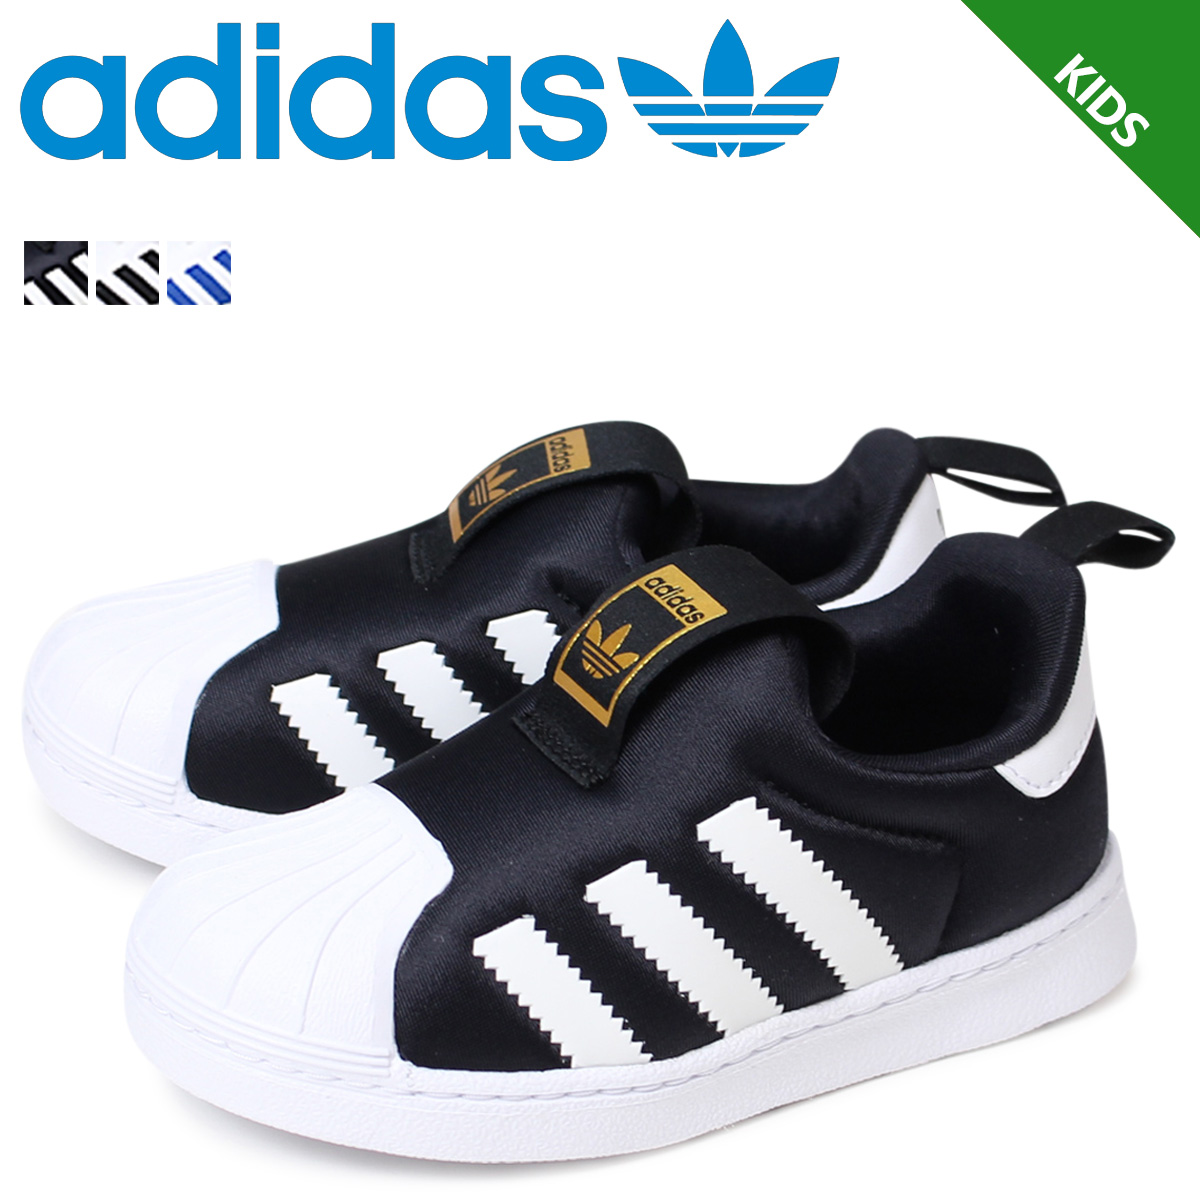 adidas superstar on kids